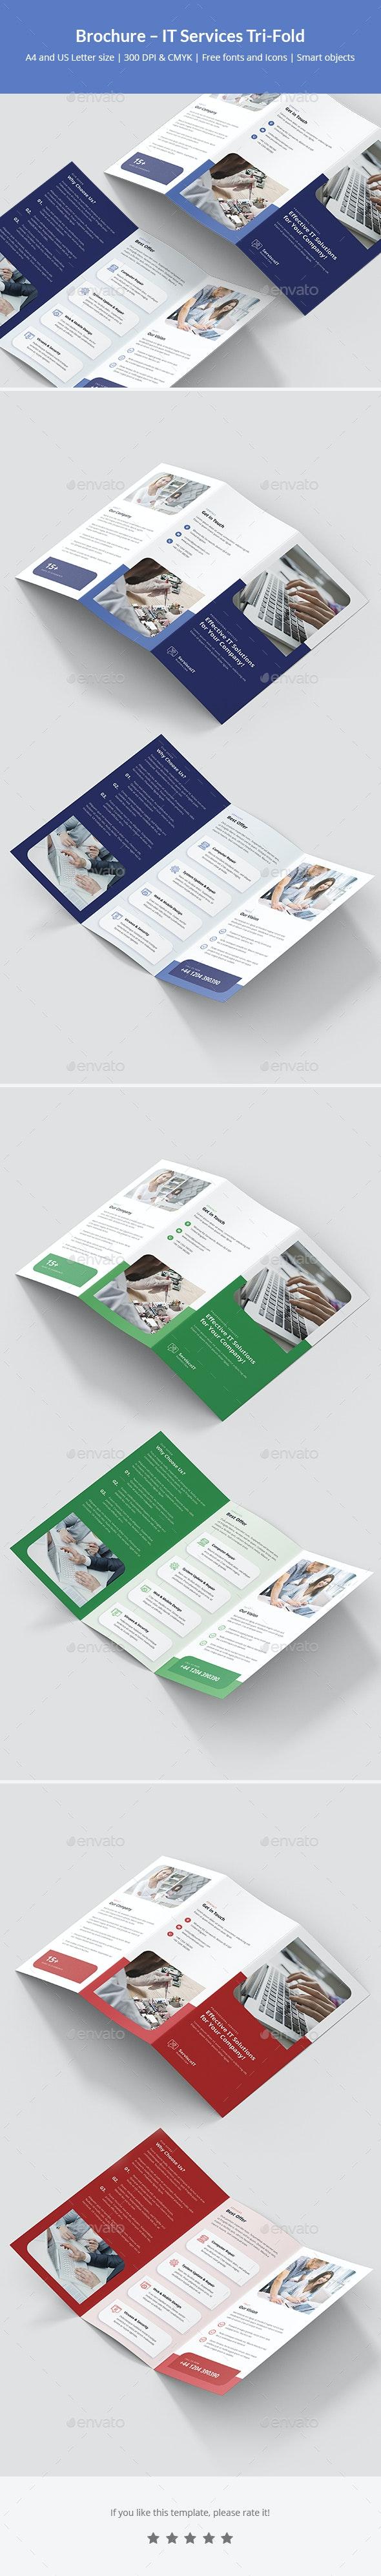 Brochure – IT Services Tri-Fold - Corporate Brochures